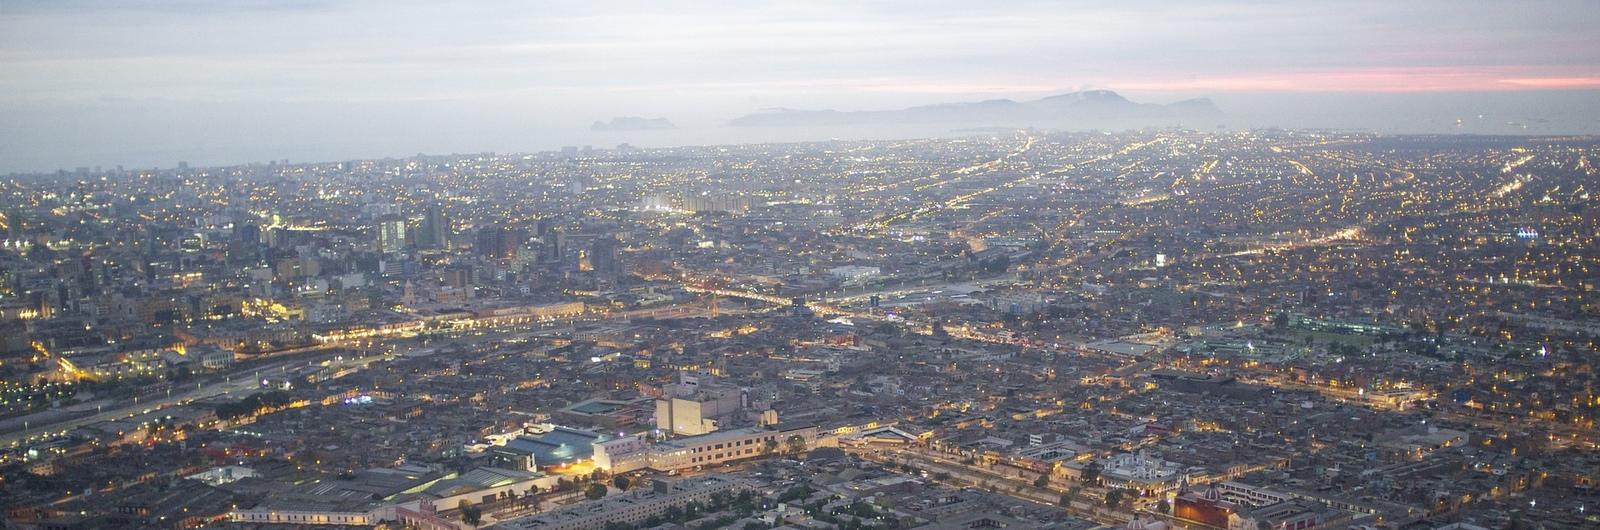 lima city header